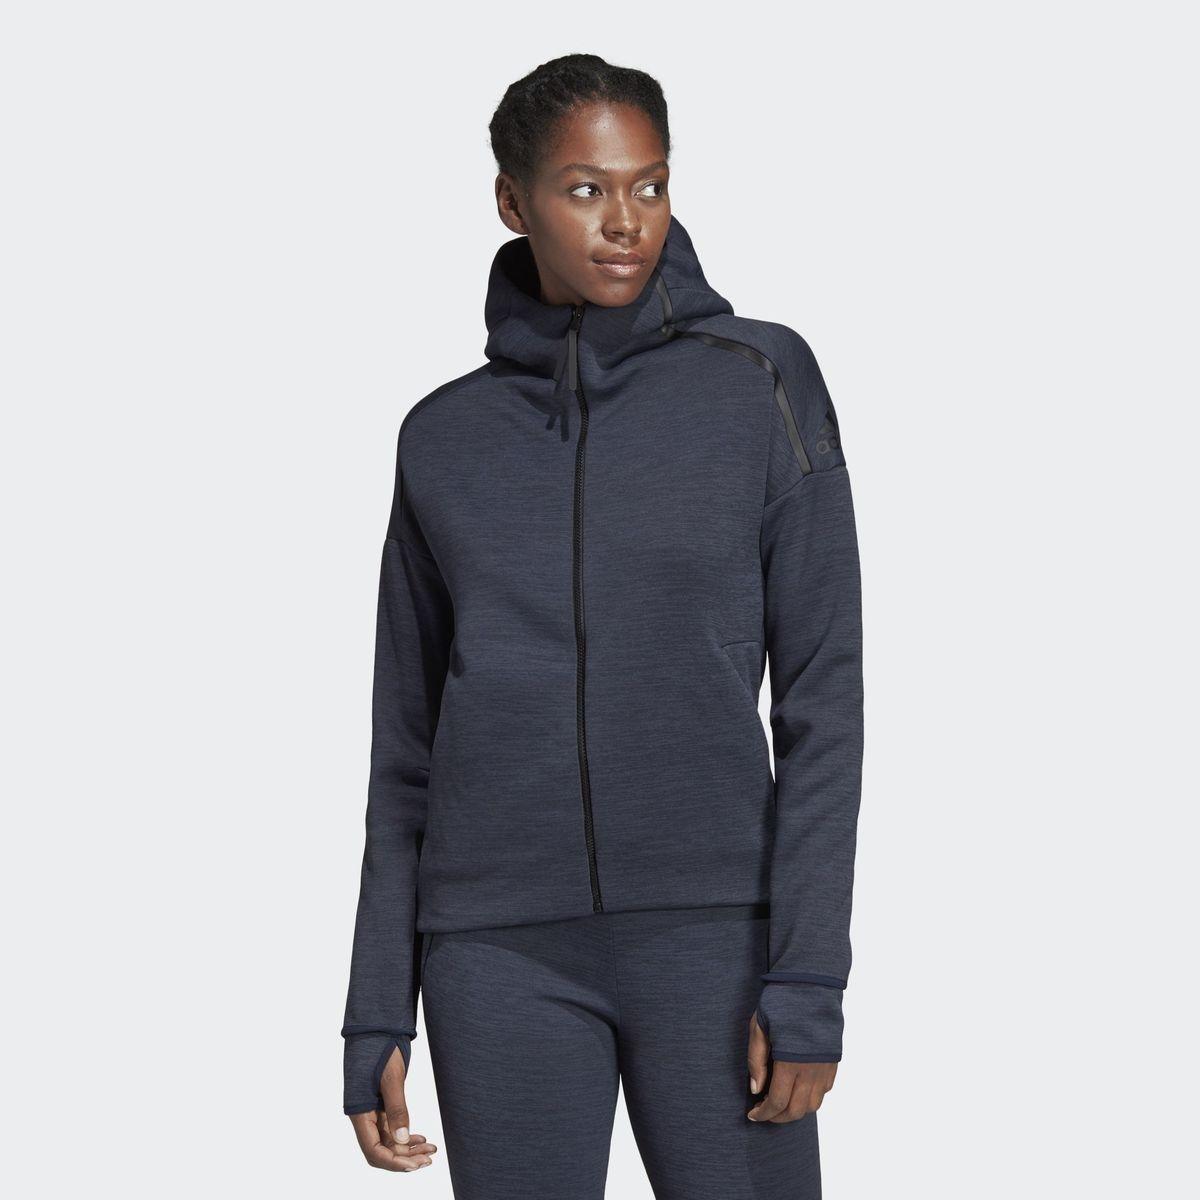 Adidas performance zne veste en sweat black femme noir